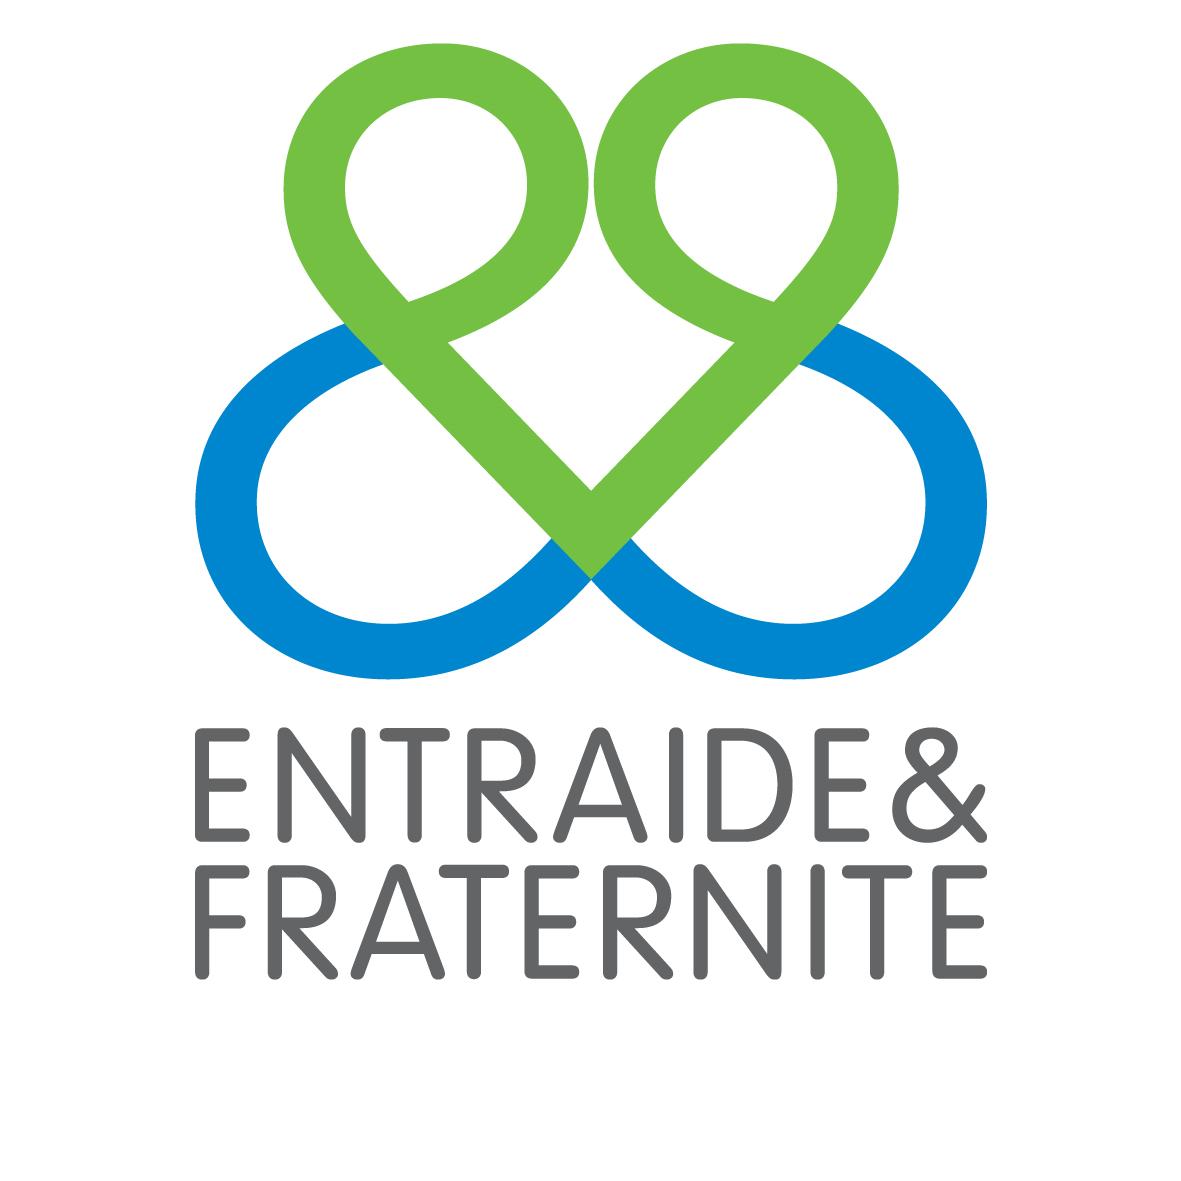 Entraide et fraternite